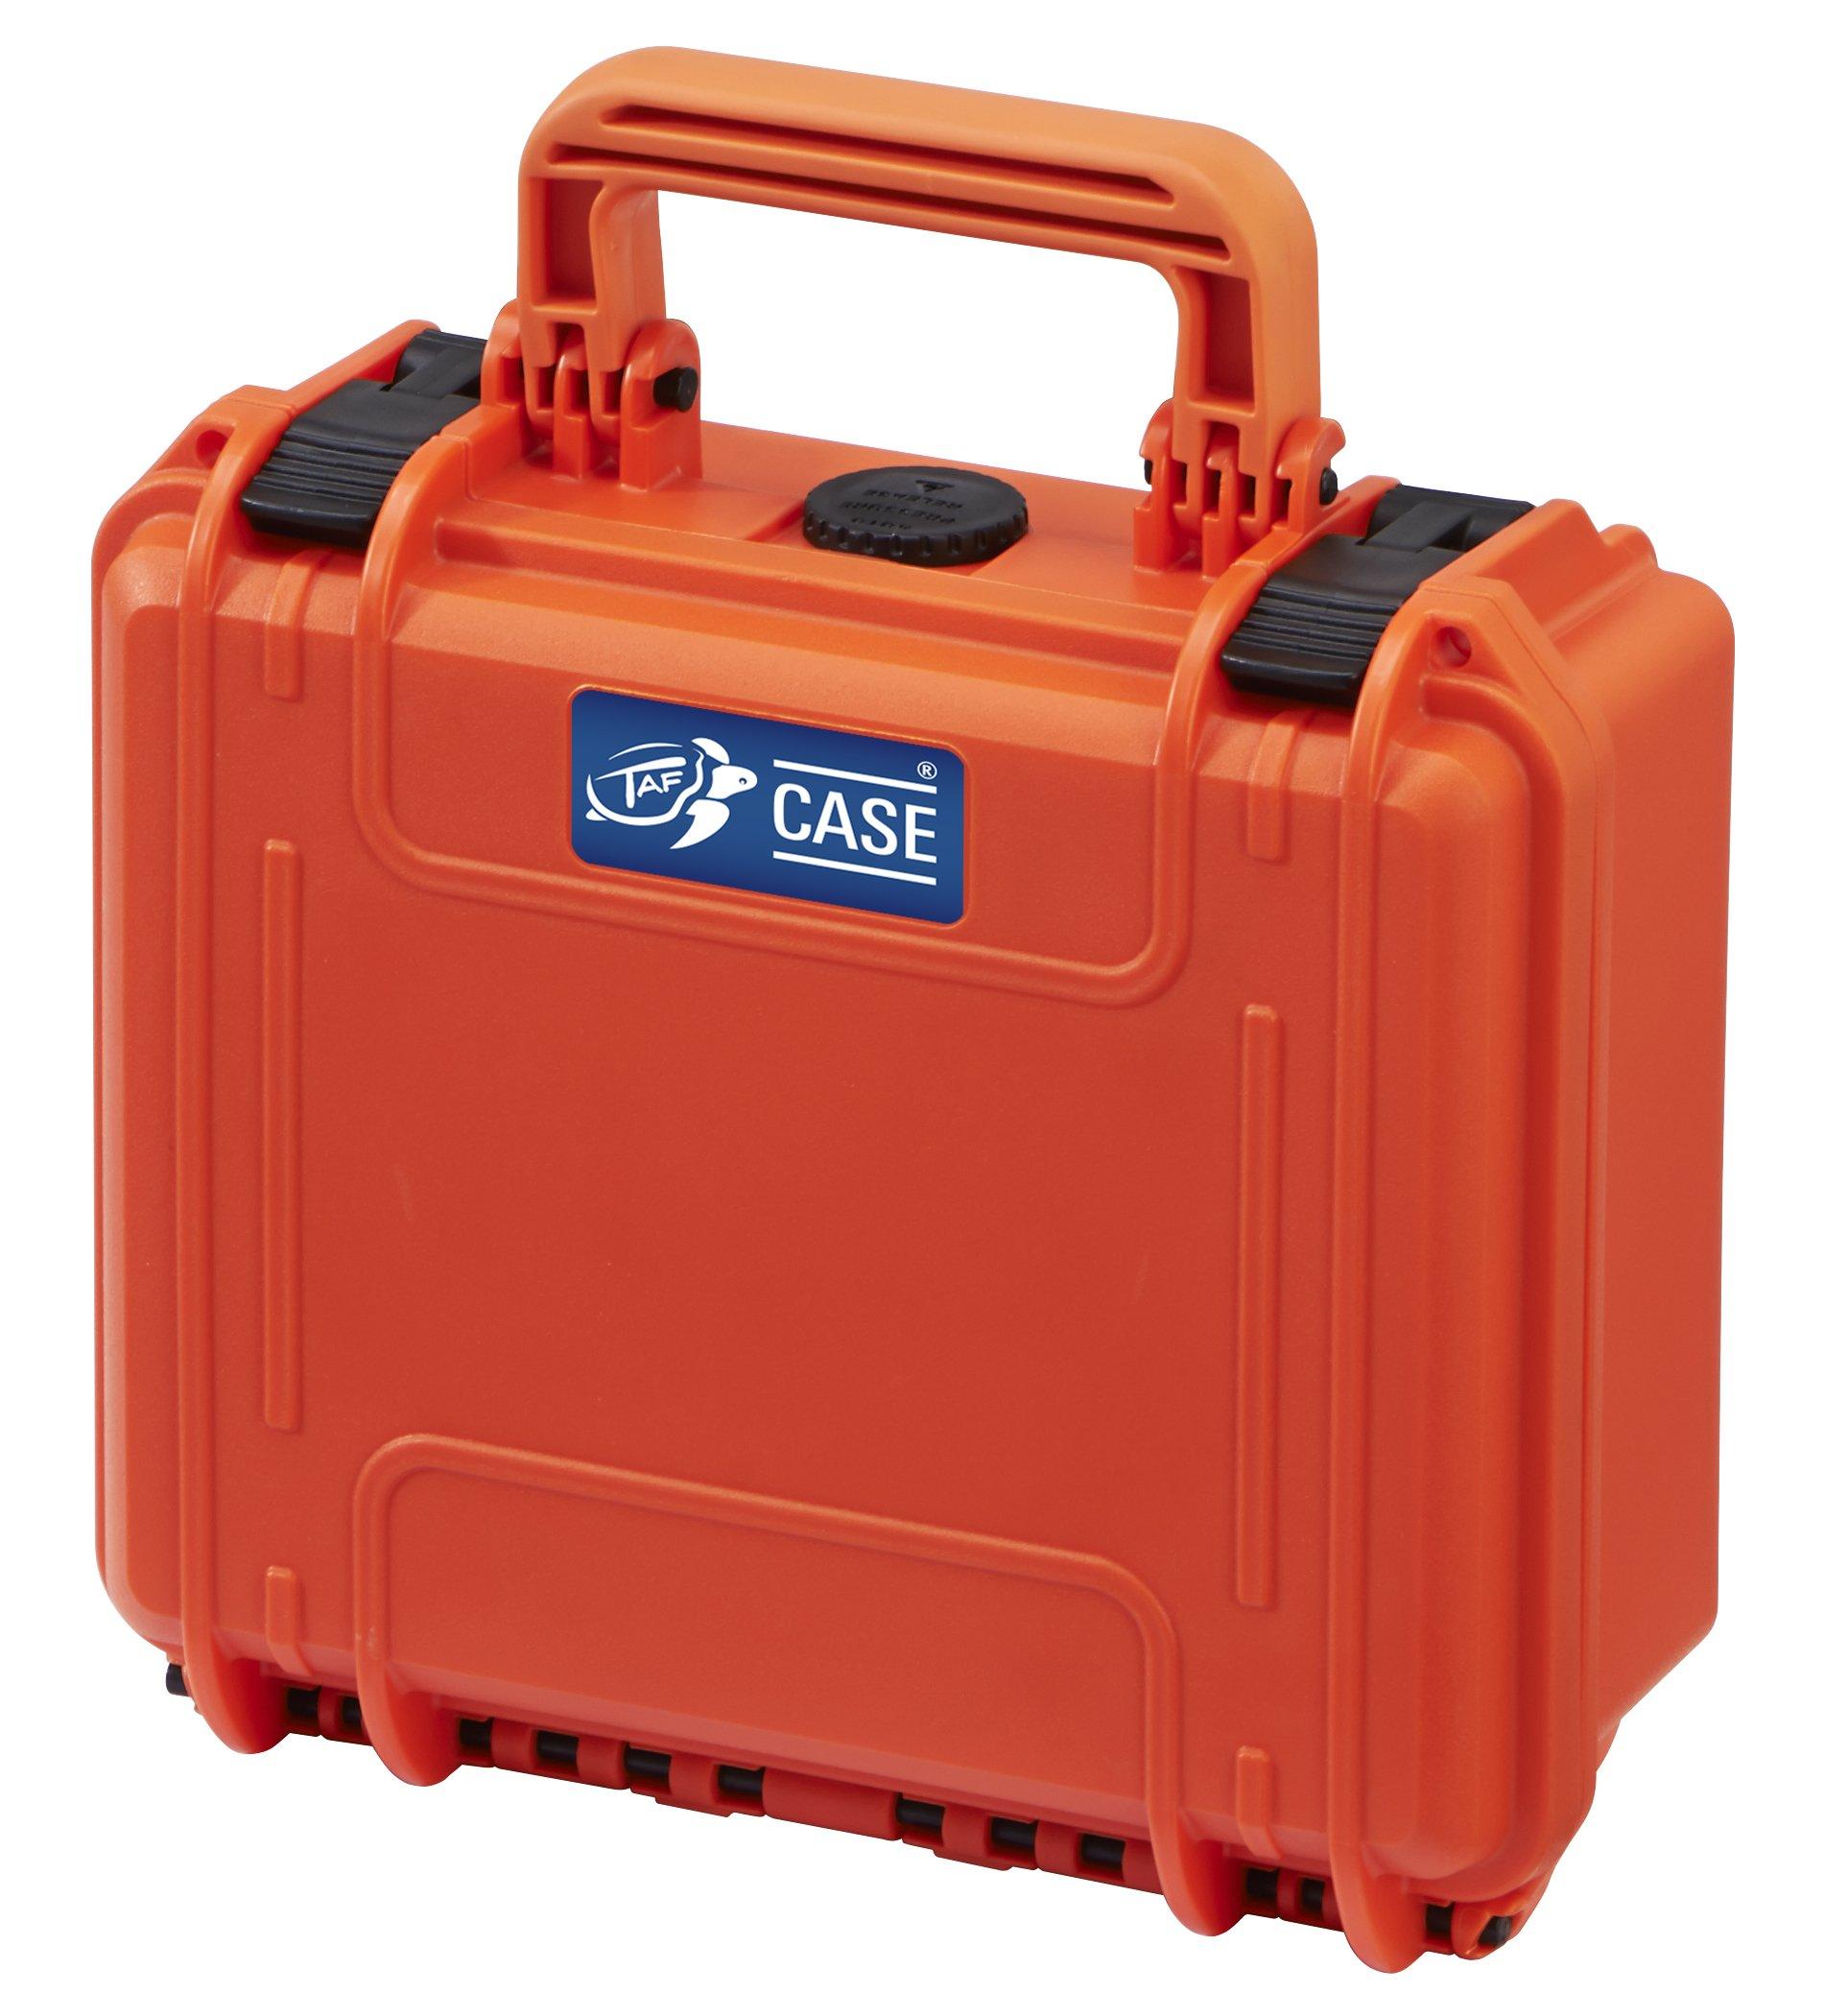 TAF-Case-Outdoor-Koffer-wasserdicht-Universalserie